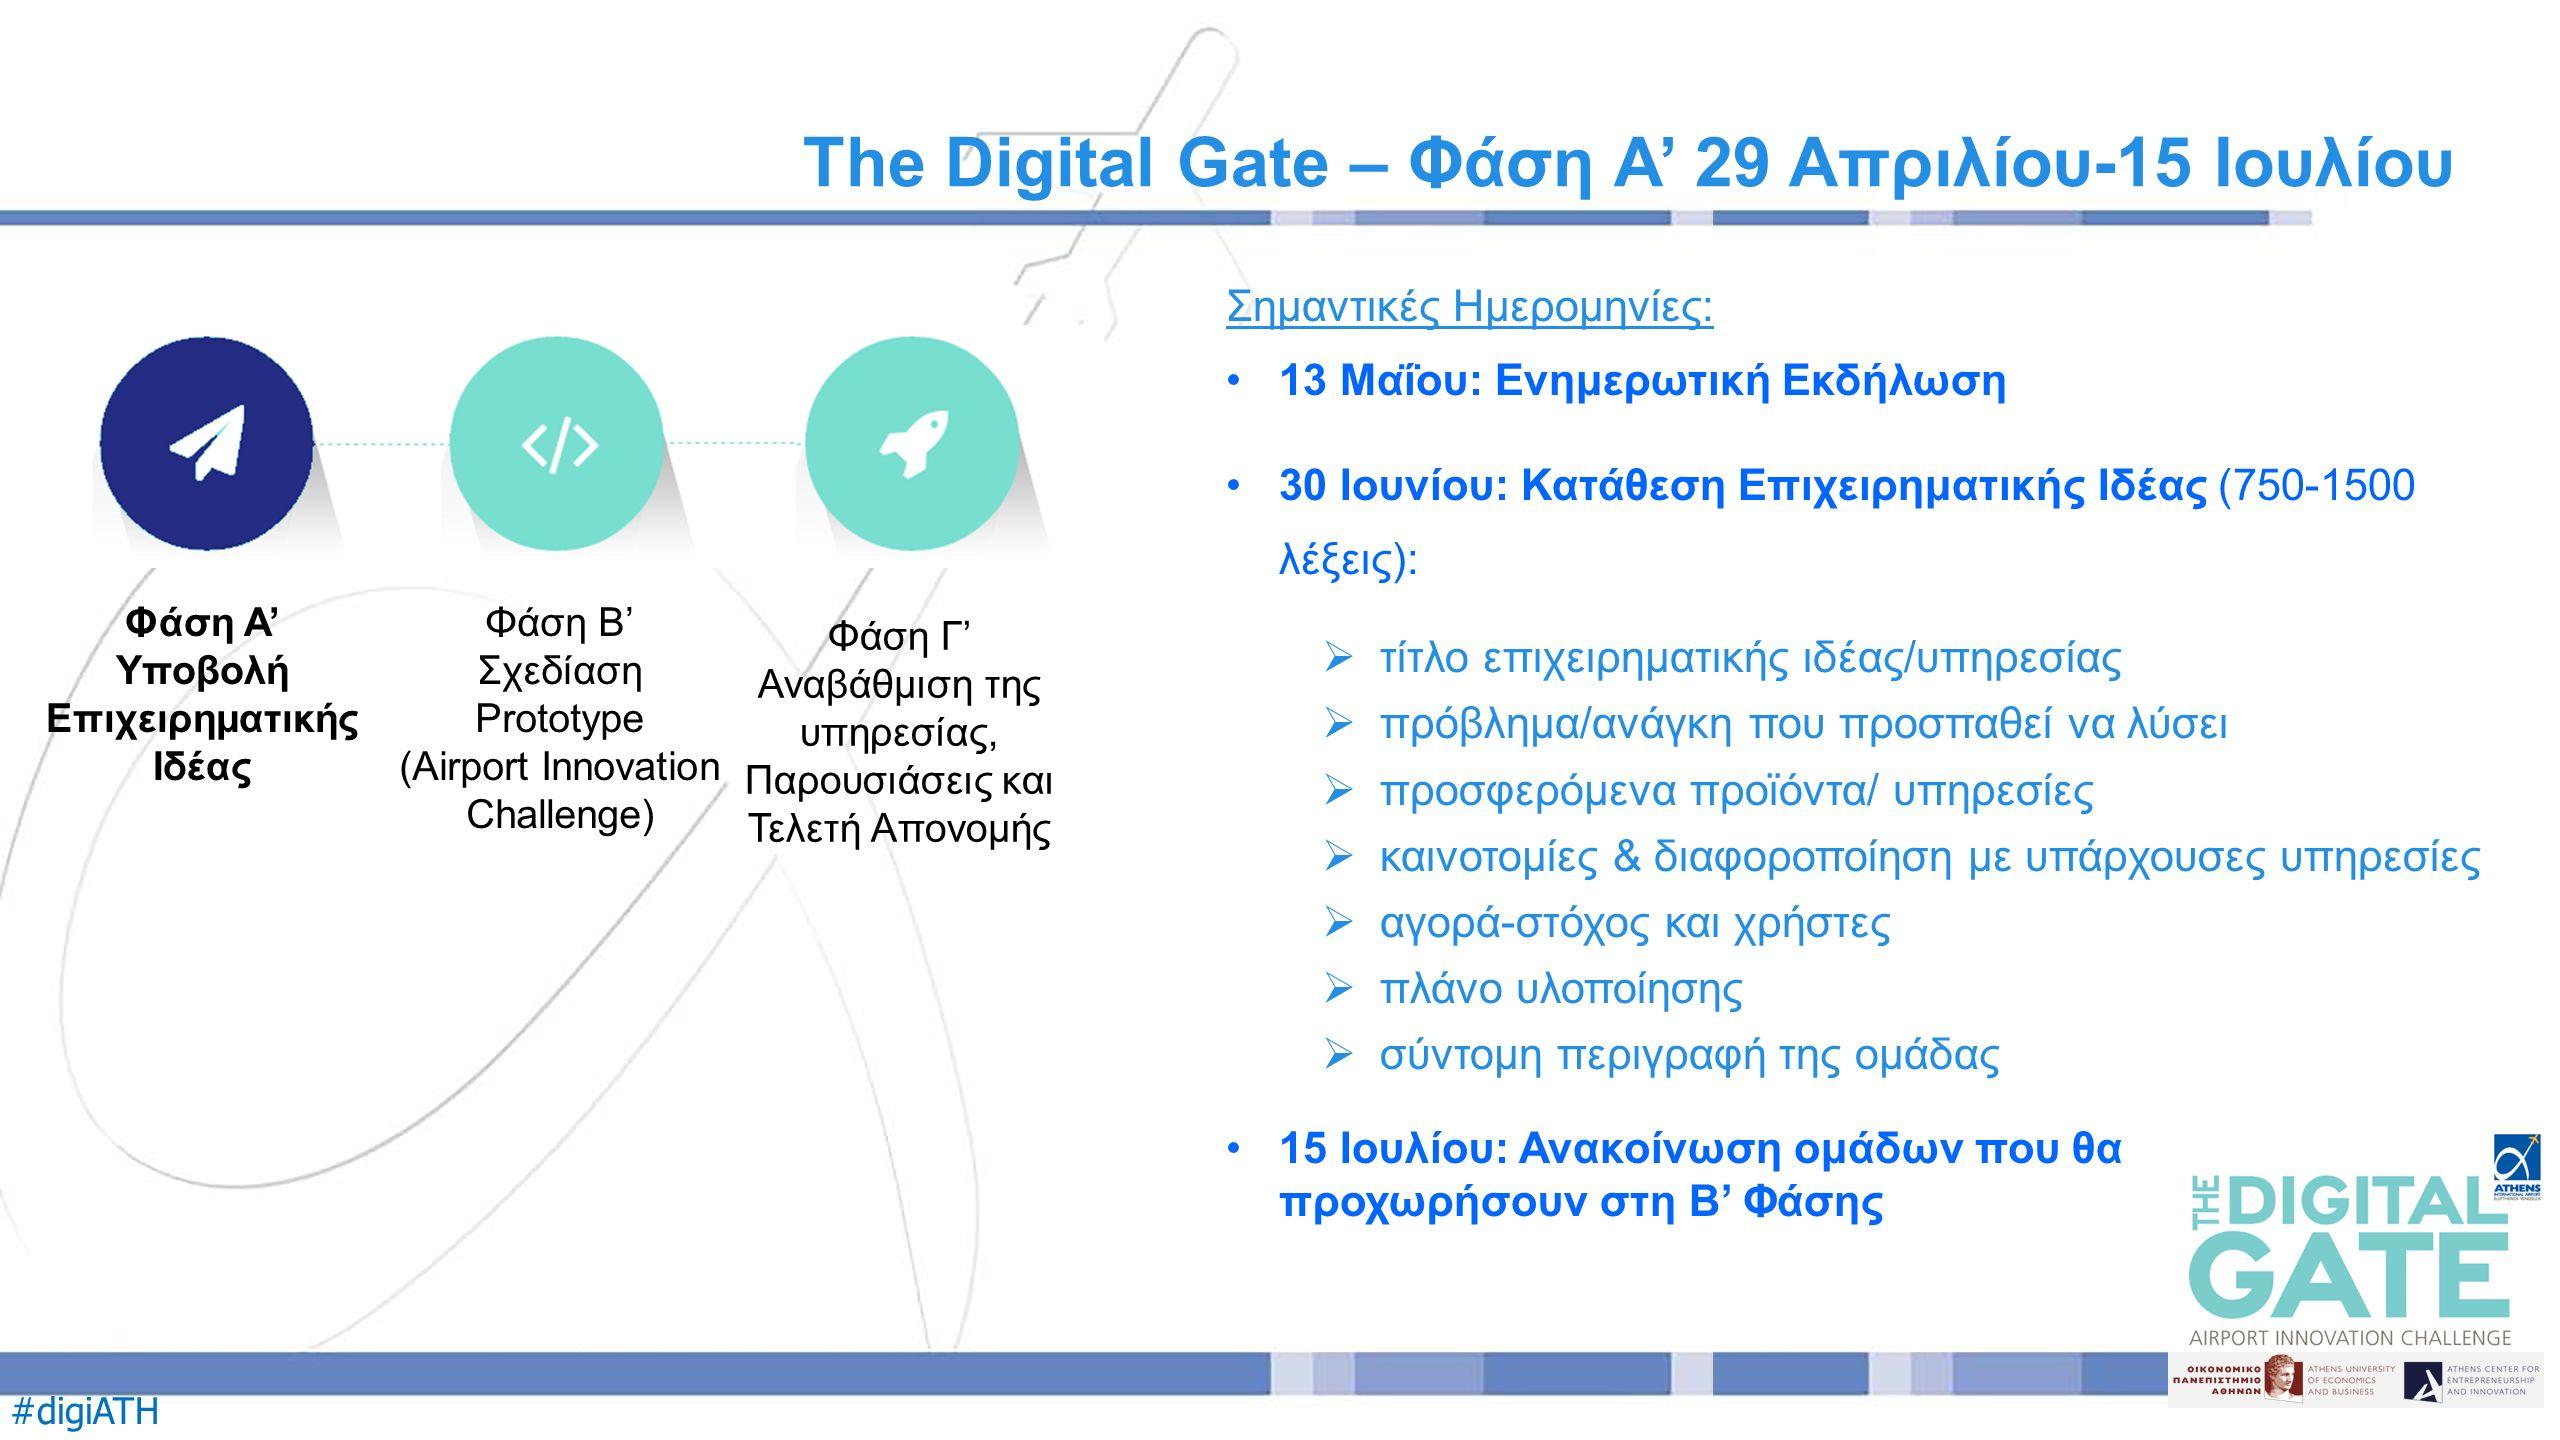 #digiATH Σημαντικές Ημερομηνίες: 13 Μαΐου: Ενημερωτική Εκδήλωση 30 Ιουνίου: Κατάθεση Επιχειρηματικής Ιδέας (750-1500 λέξεις):  τίτλο επιχειρηματικής ιδέας/υπηρεσίας  πρόβλημα/ανάγκη που προσπαθεί να λύσει  προσφερόμενα προϊόντα/ υπηρεσίες  καινοτομίες & διαφοροποίηση με υπάρχουσες υπηρεσίες  αγορά-στόχος και χρήστες  πλάνο υλοποίησης  σύντομη περιγραφή της ομάδας 15 Ιουλίου: Ανακοίνωση ομάδων που θα προχωρήσουν στη Β' Φάσης The Digital Gate – Φάση Α' 29 Απριλίου-15 Ιουλίου Φάση Α' Υποβολή Επιχειρηματικής Ιδέας Φάση Β' Σχεδίαση Prototype (Airport Innovation Challenge) Φάση Γ' Αναβάθμιση της υπηρεσίας, Παρουσιάσεις και Τελετή Απονομής